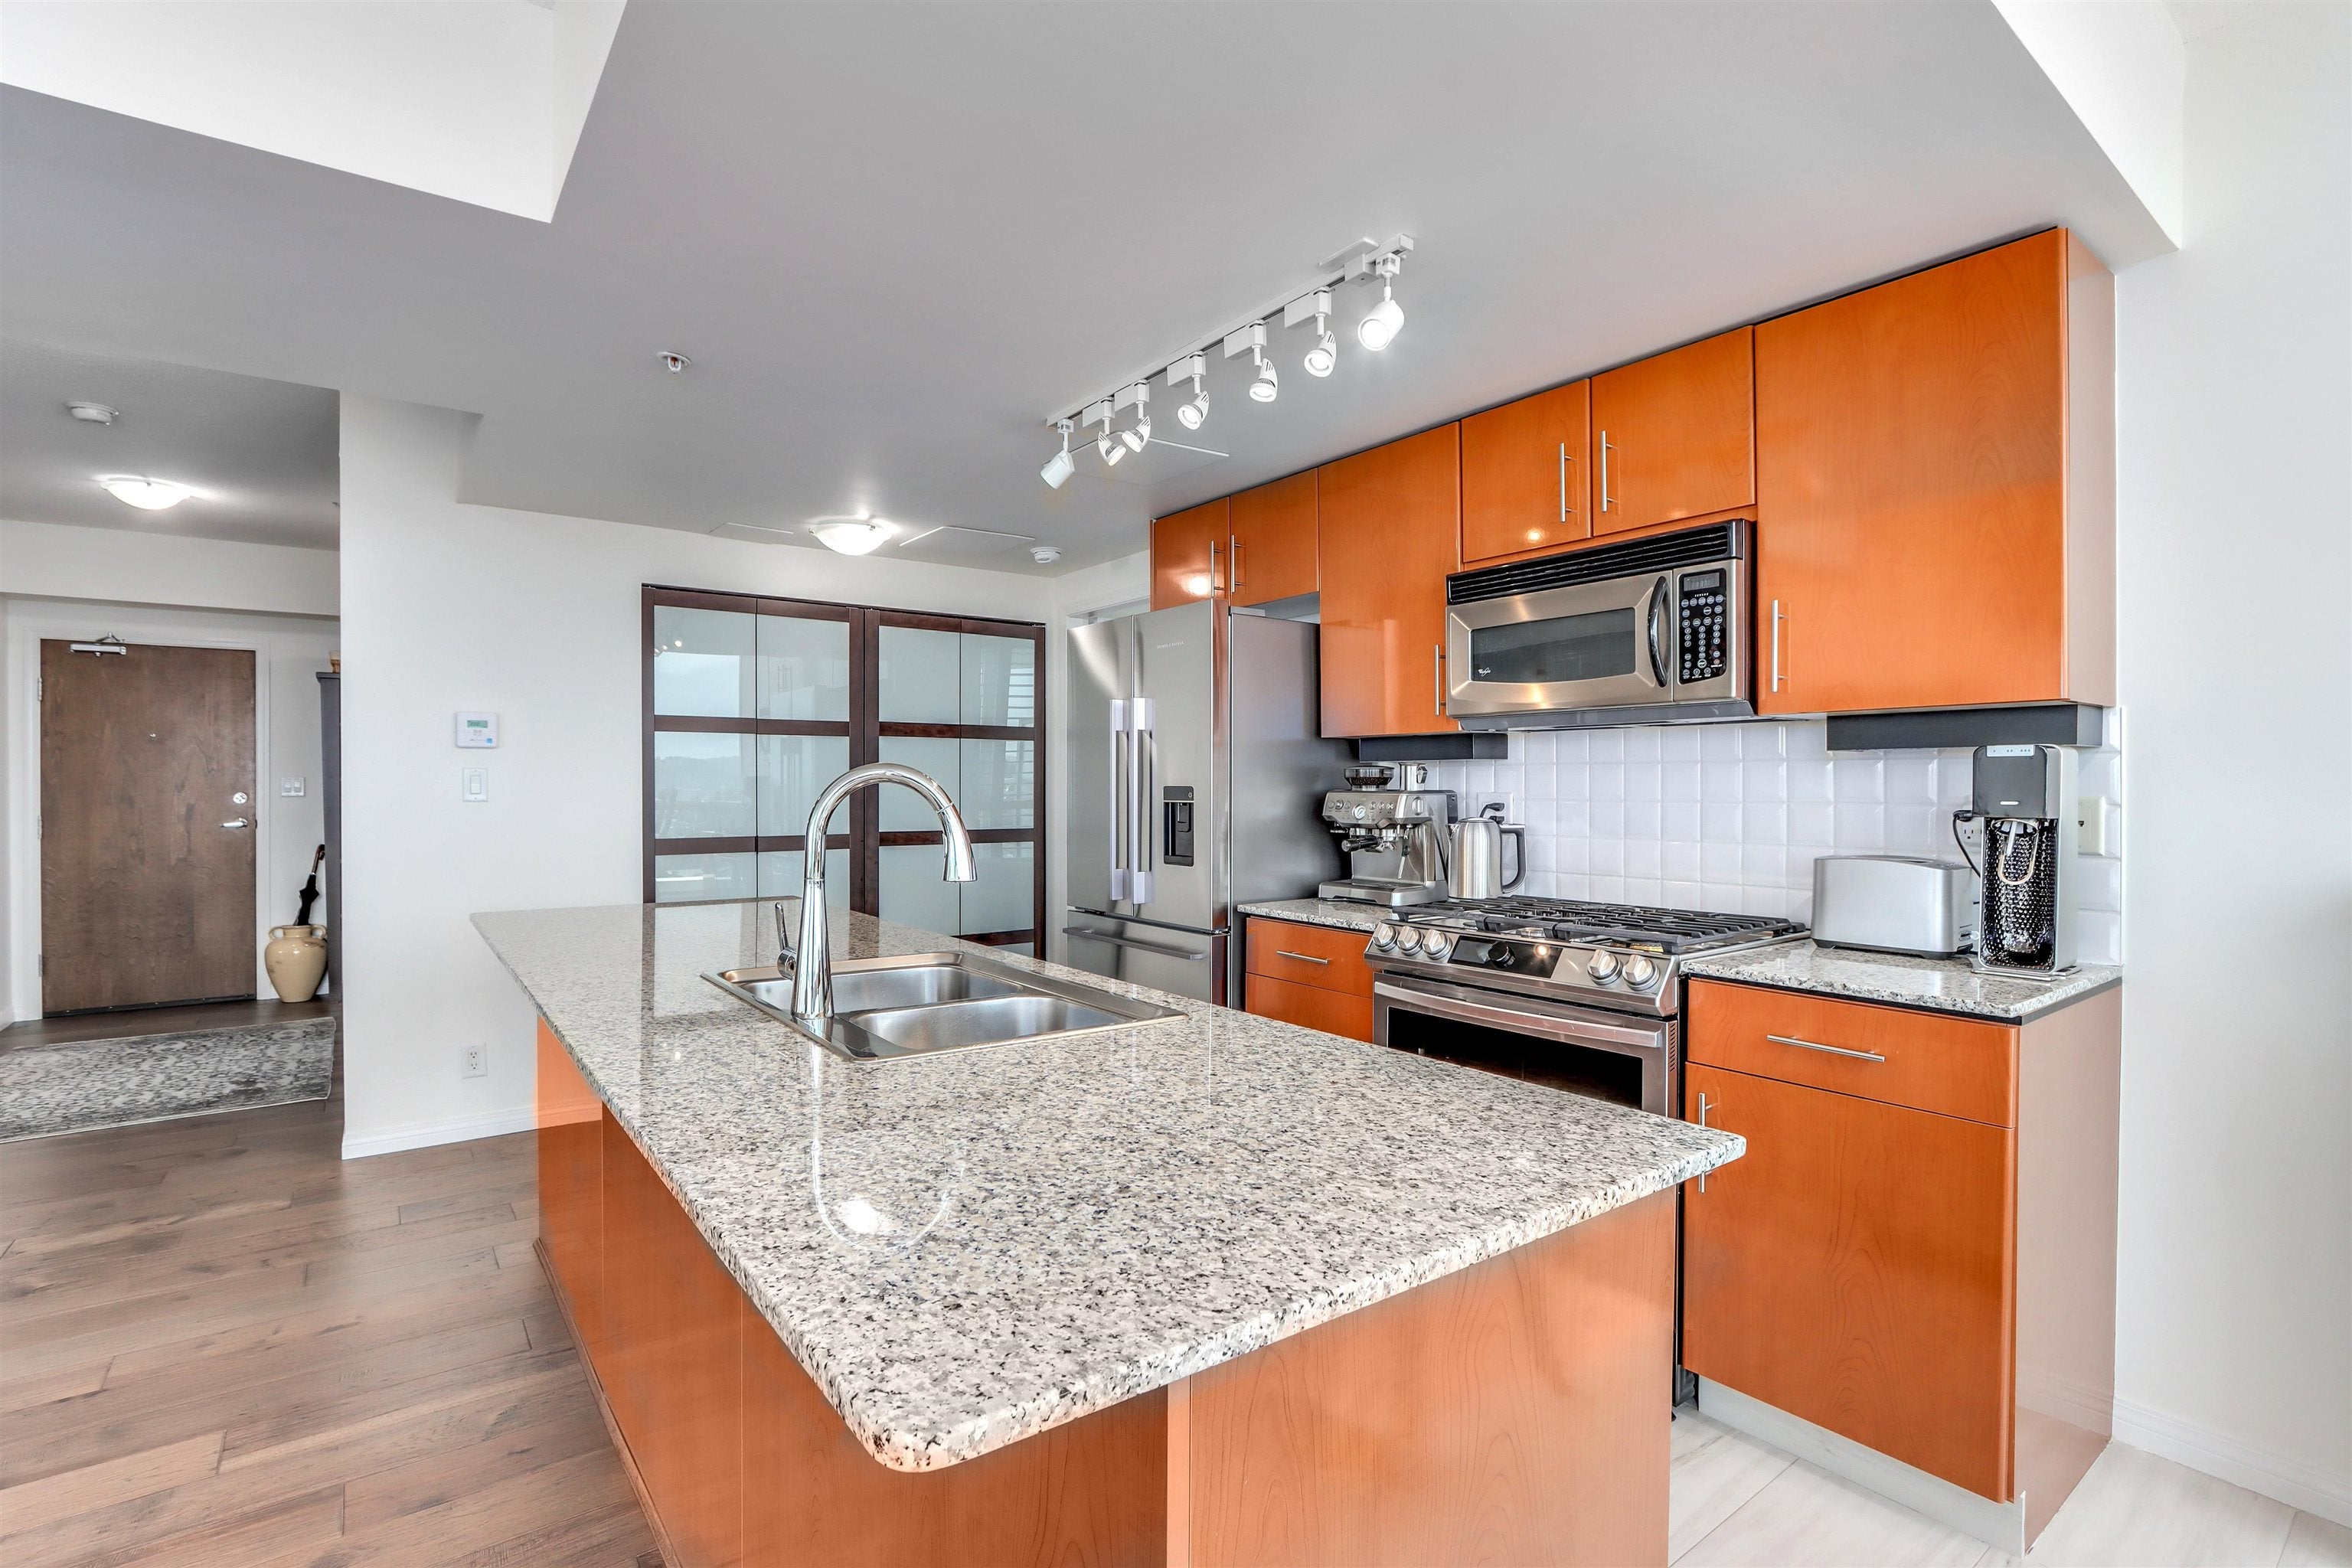 2202 188 E ESPLANADE - Lower Lonsdale Apartment/Condo for sale, 2 Bedrooms (R2618412) - #5